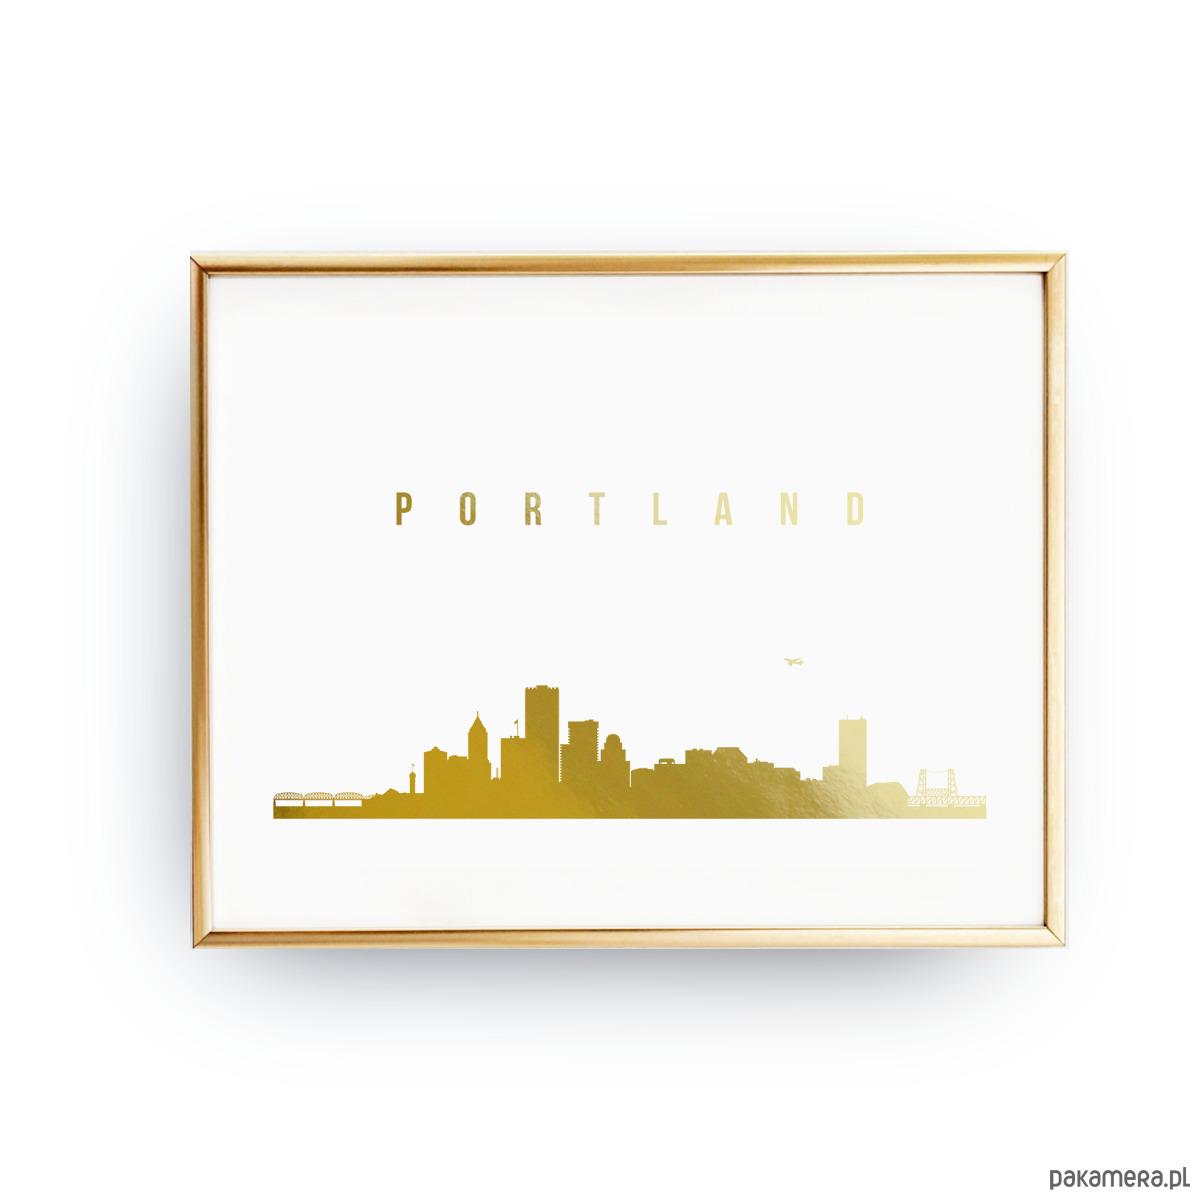 Plakat Portland Złoty Druk Pakamerapl